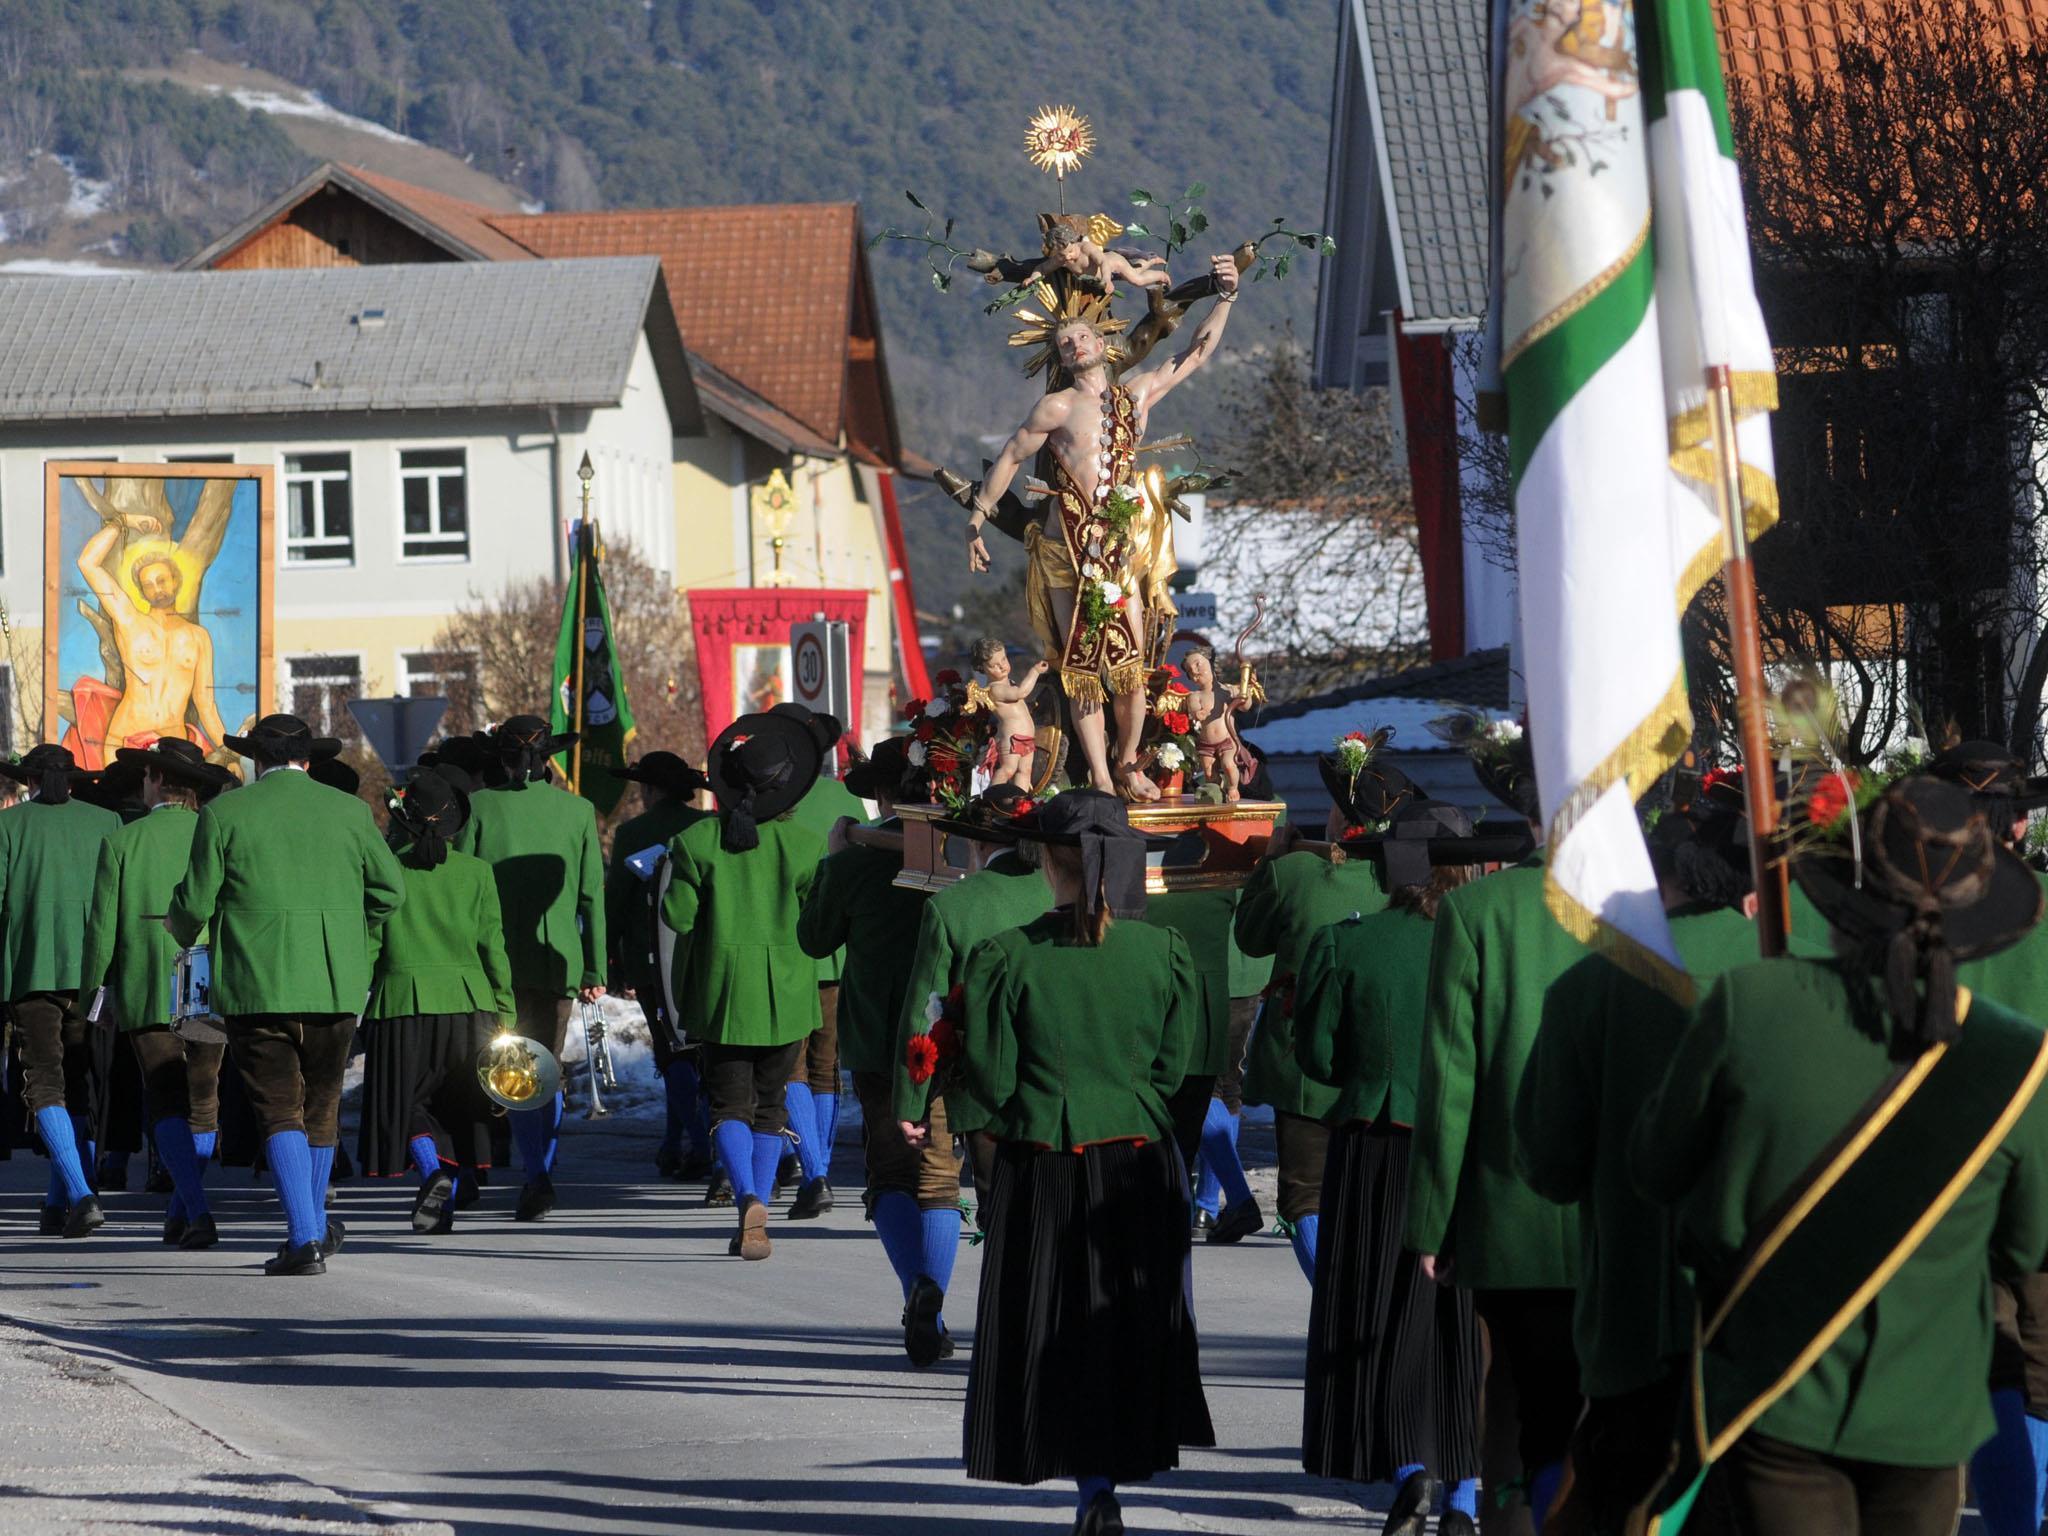 Festgottesdienst zum Sebastianifest